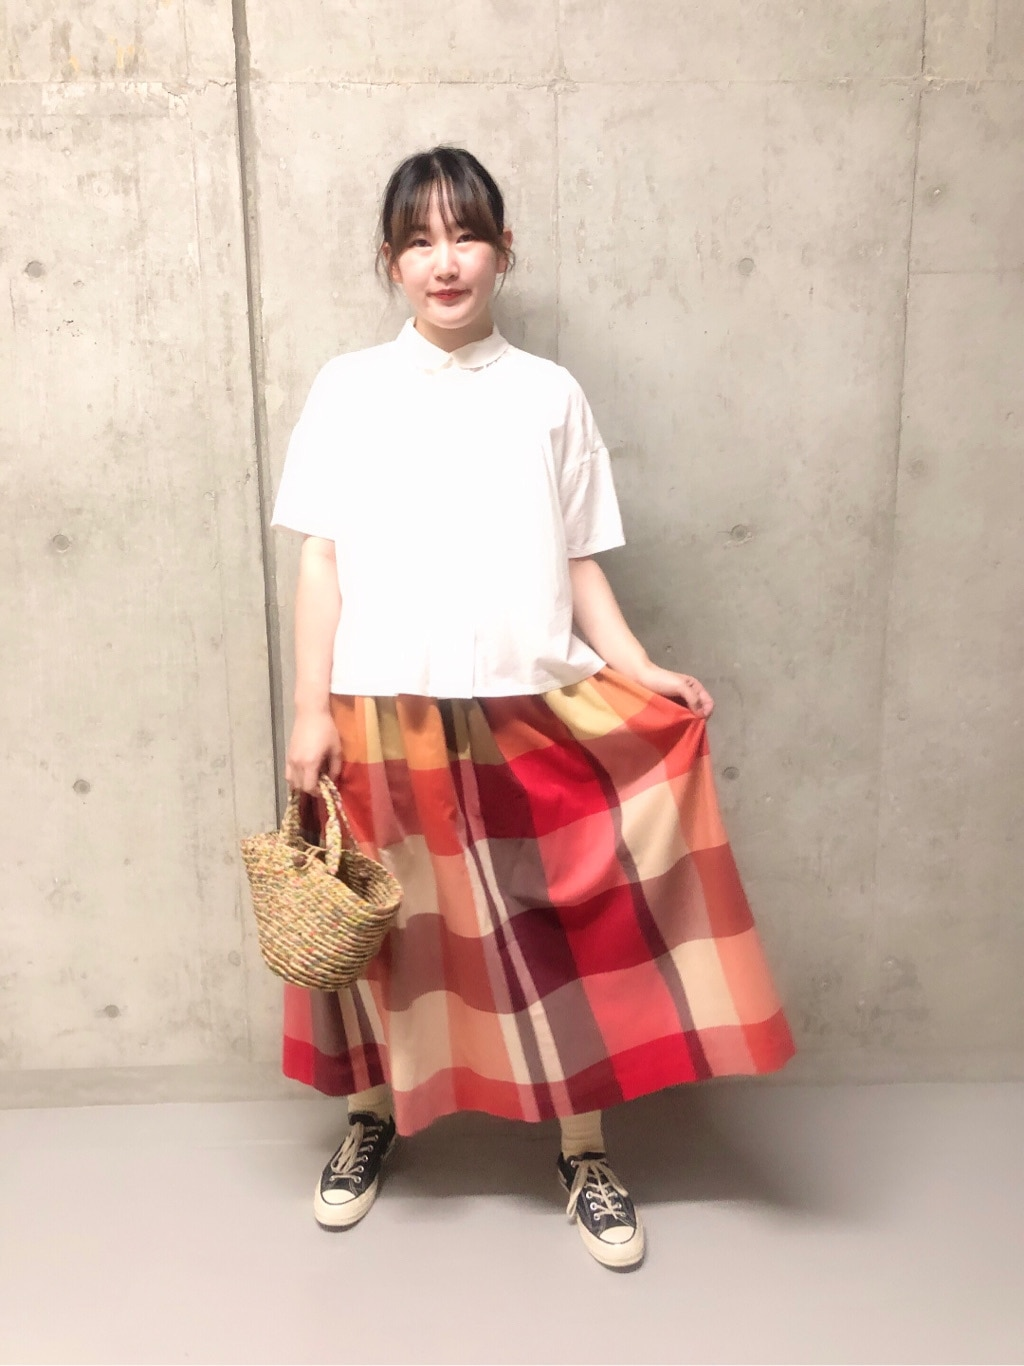 bulle de savon 阪急西宮ガーデンズ 身長:166cm 2020.04.20